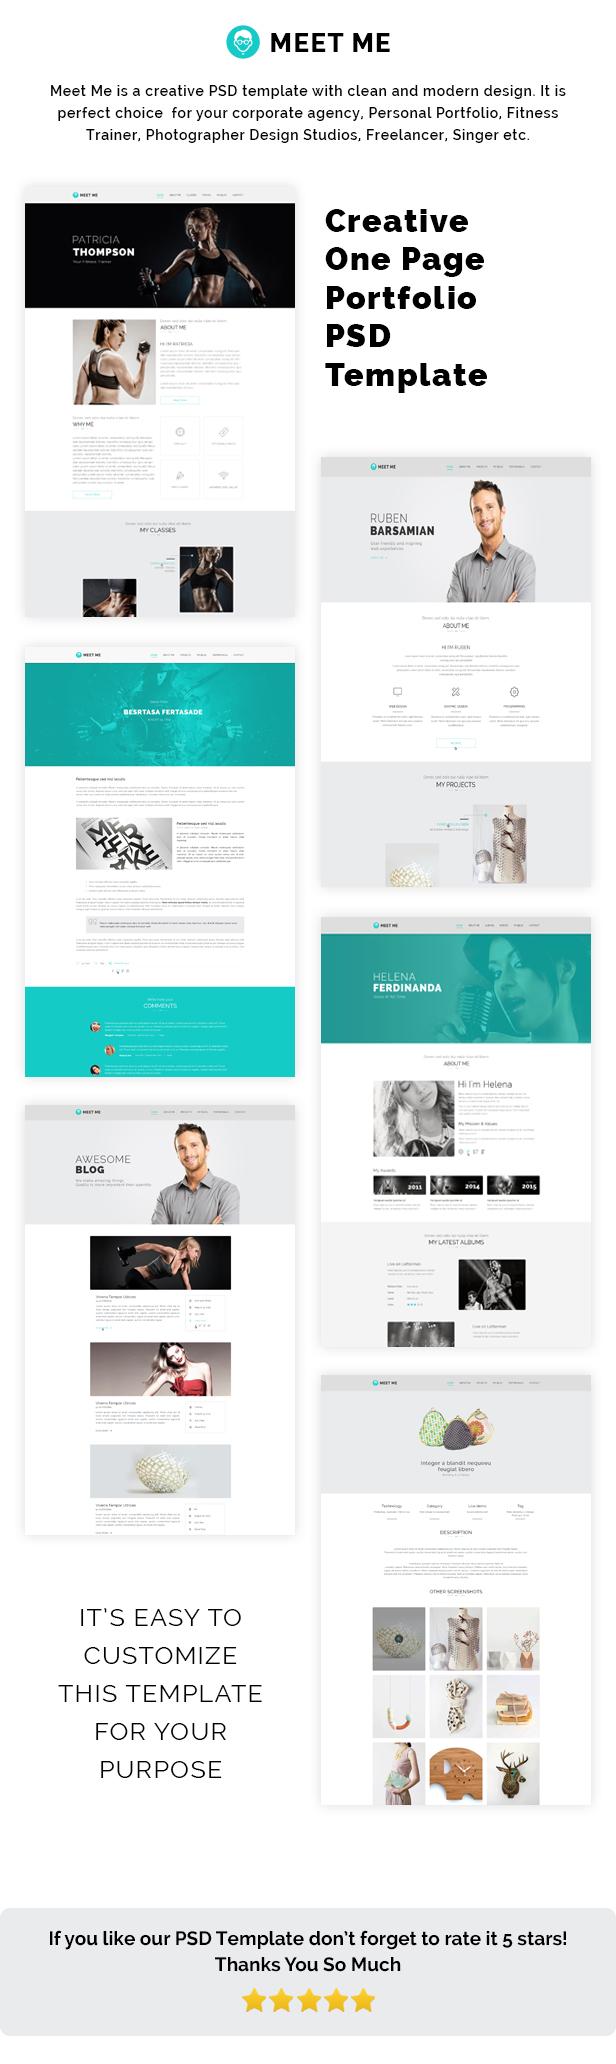 Meet Me - One Page Creative Portfolio PSD Template - 1